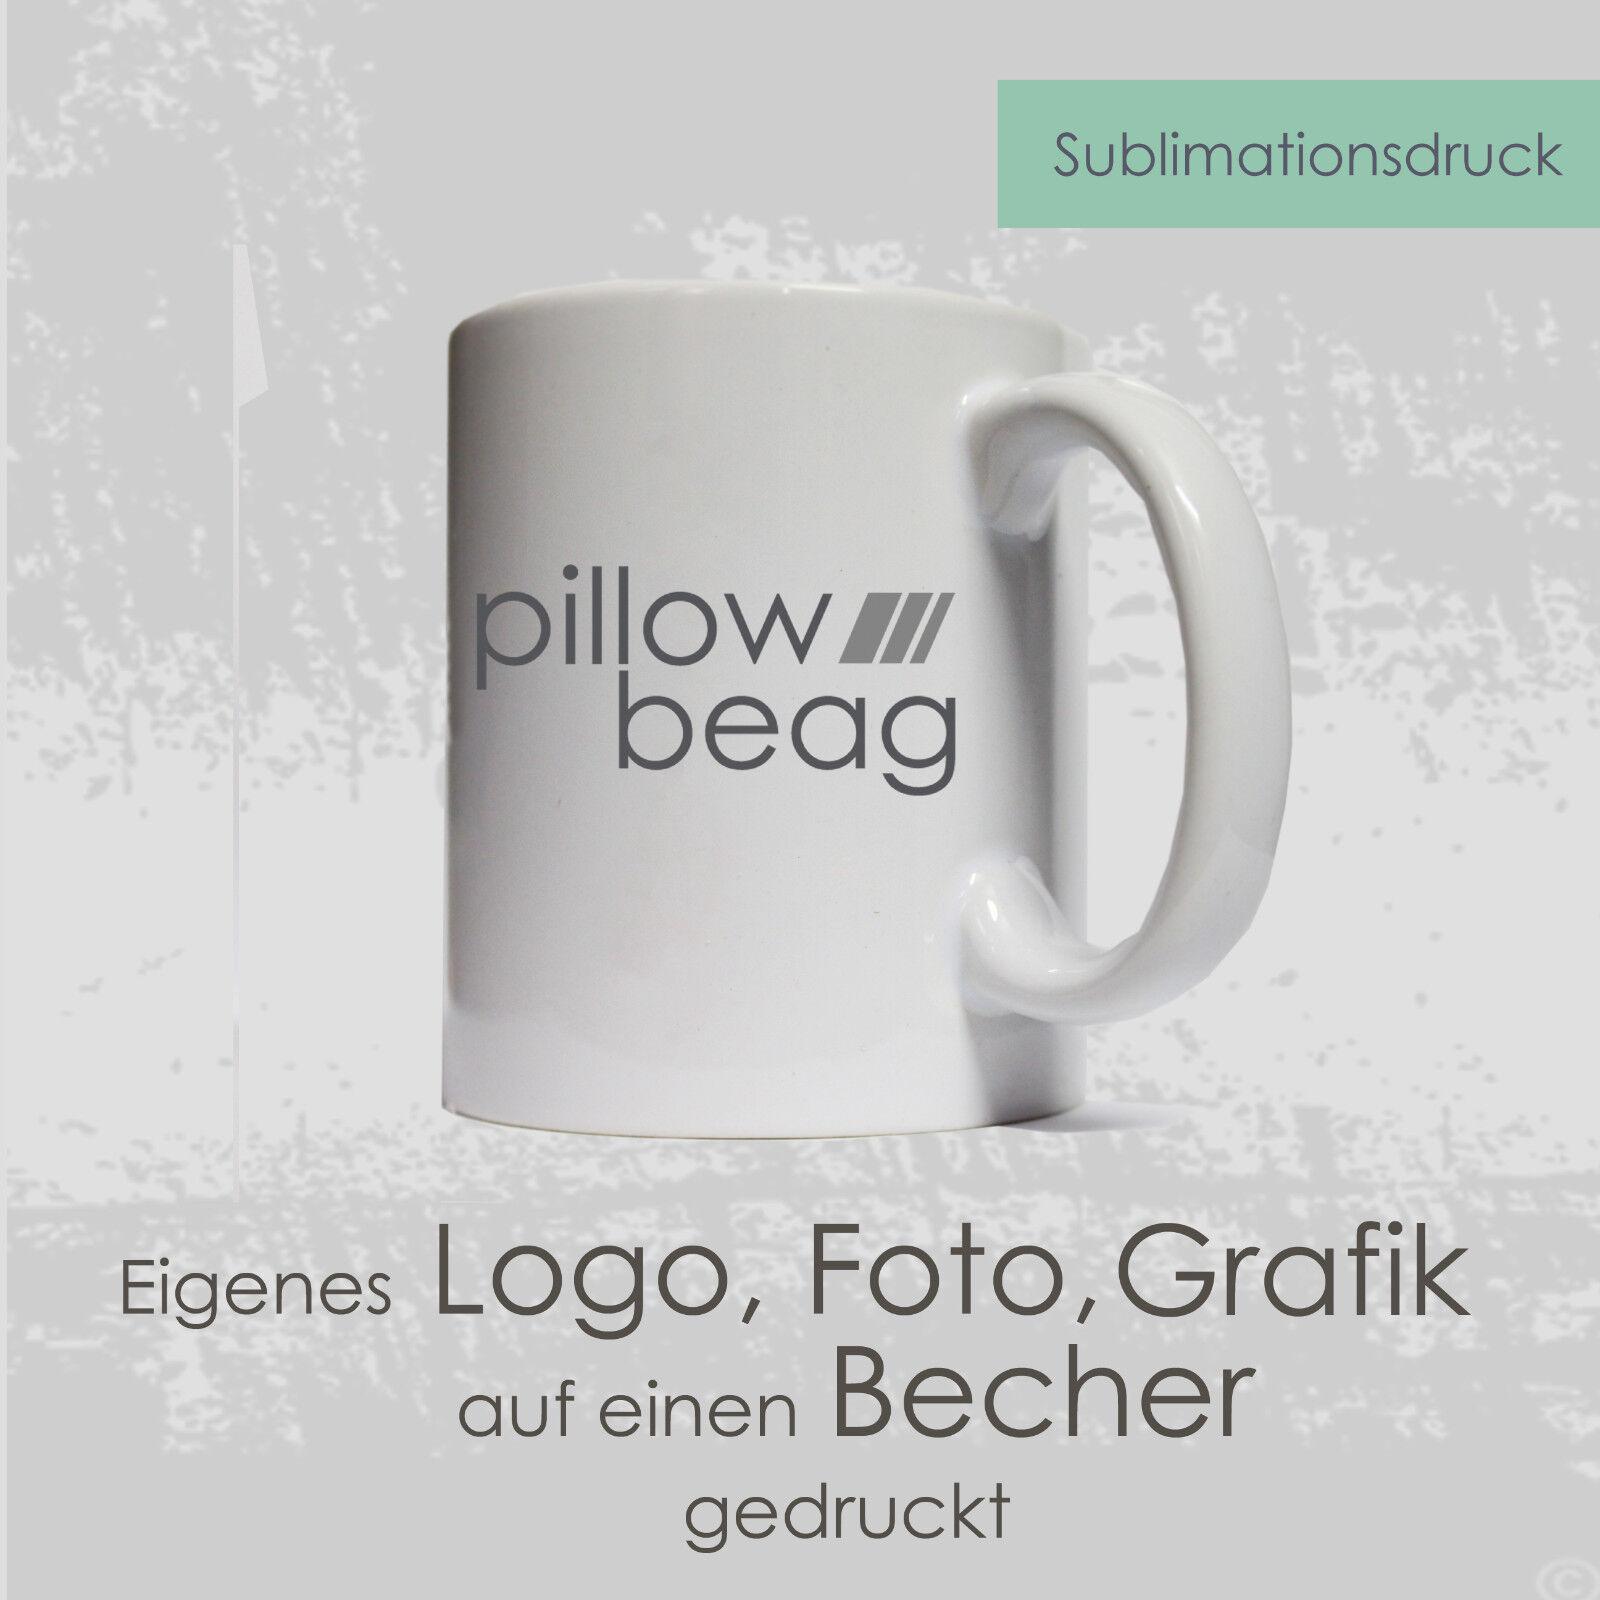 36 Fototassen eigenes Logo Bild Becher Sublimation Kaffeetasse Kaffeebecher Foto